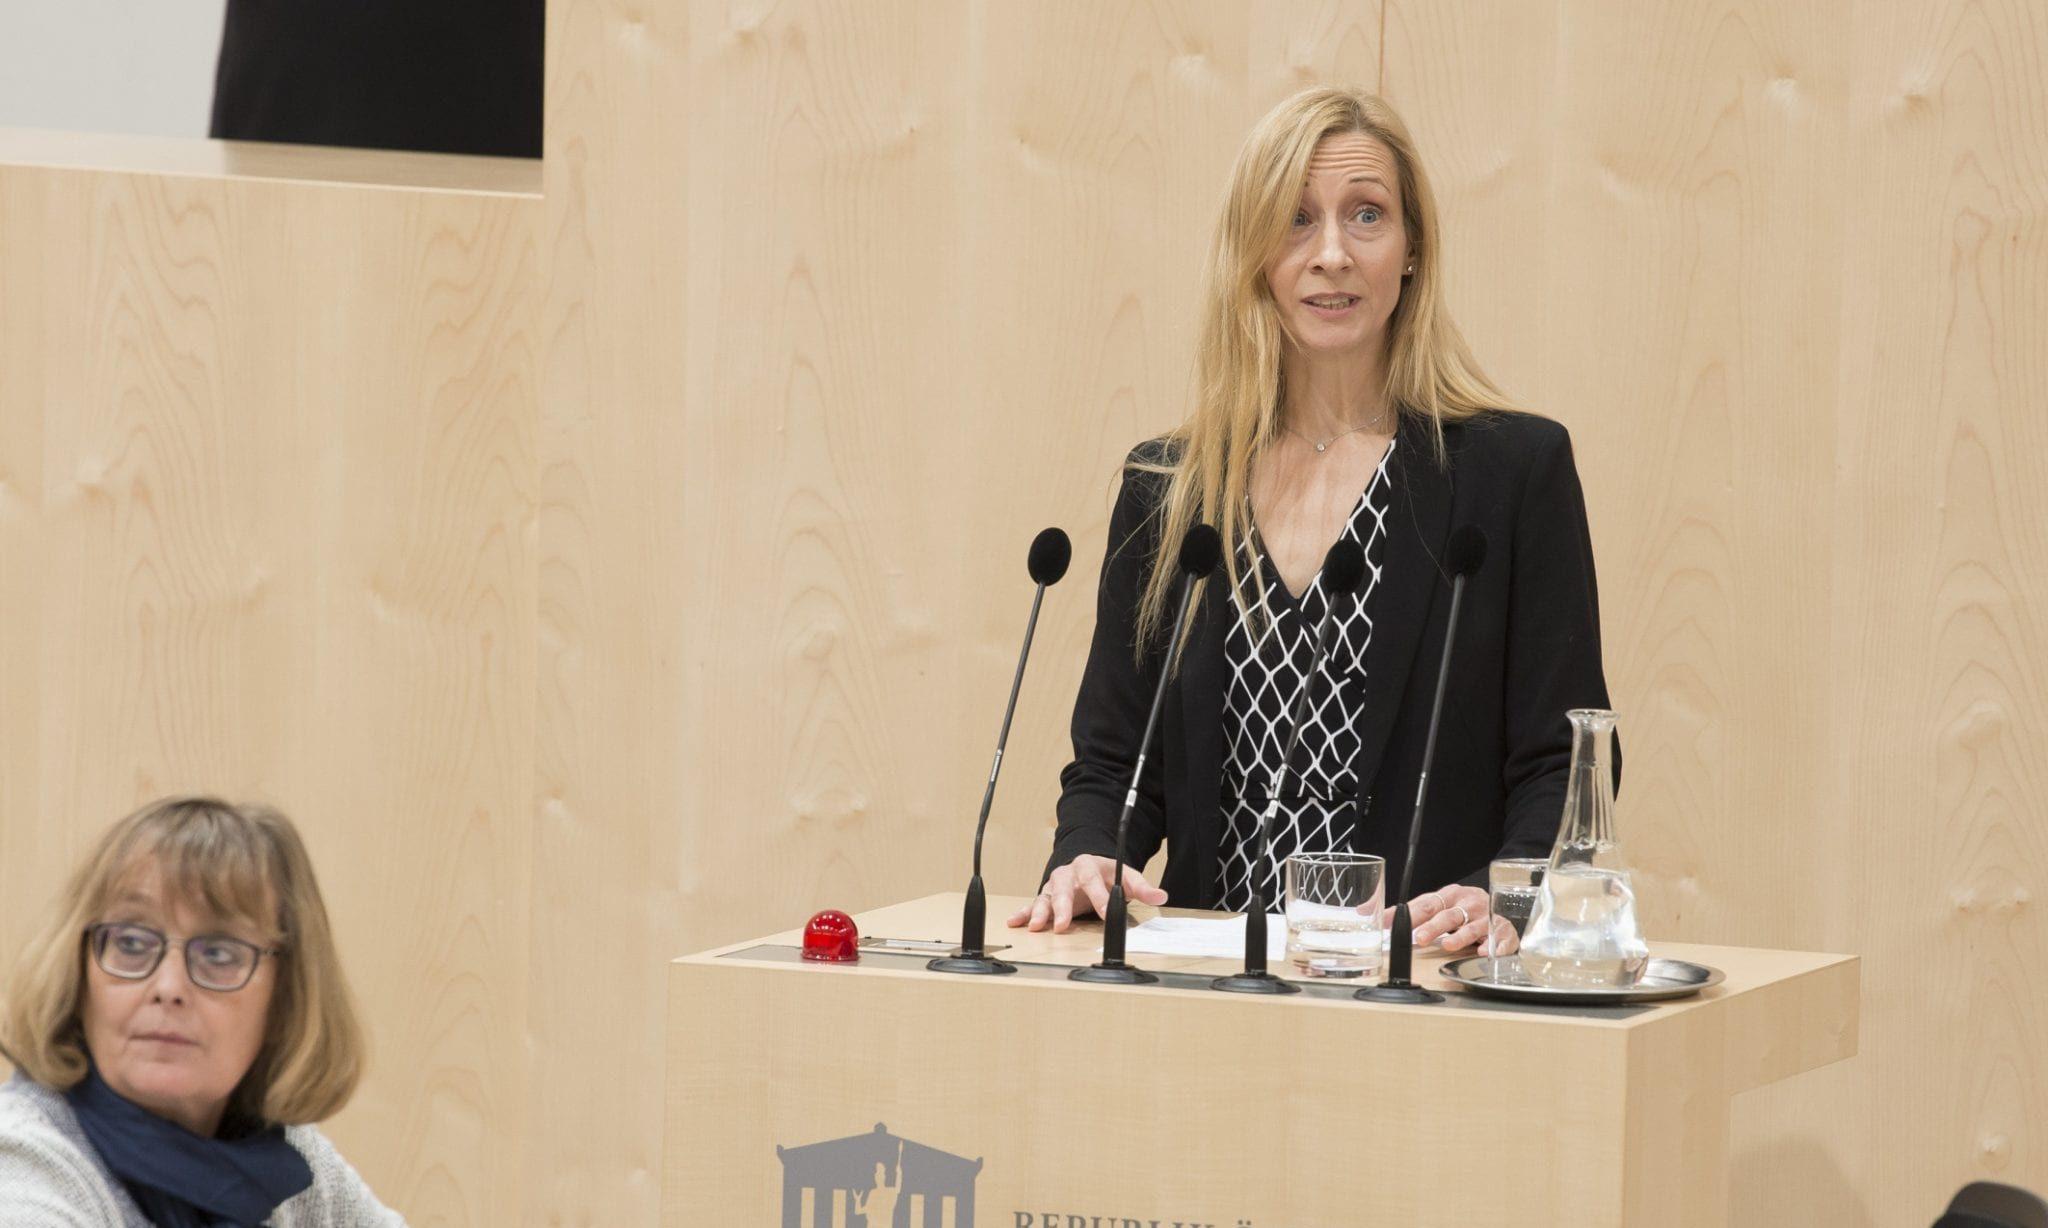 Blümel-Affäre: Grüne wehren sich gegen ÖVP-Taktik